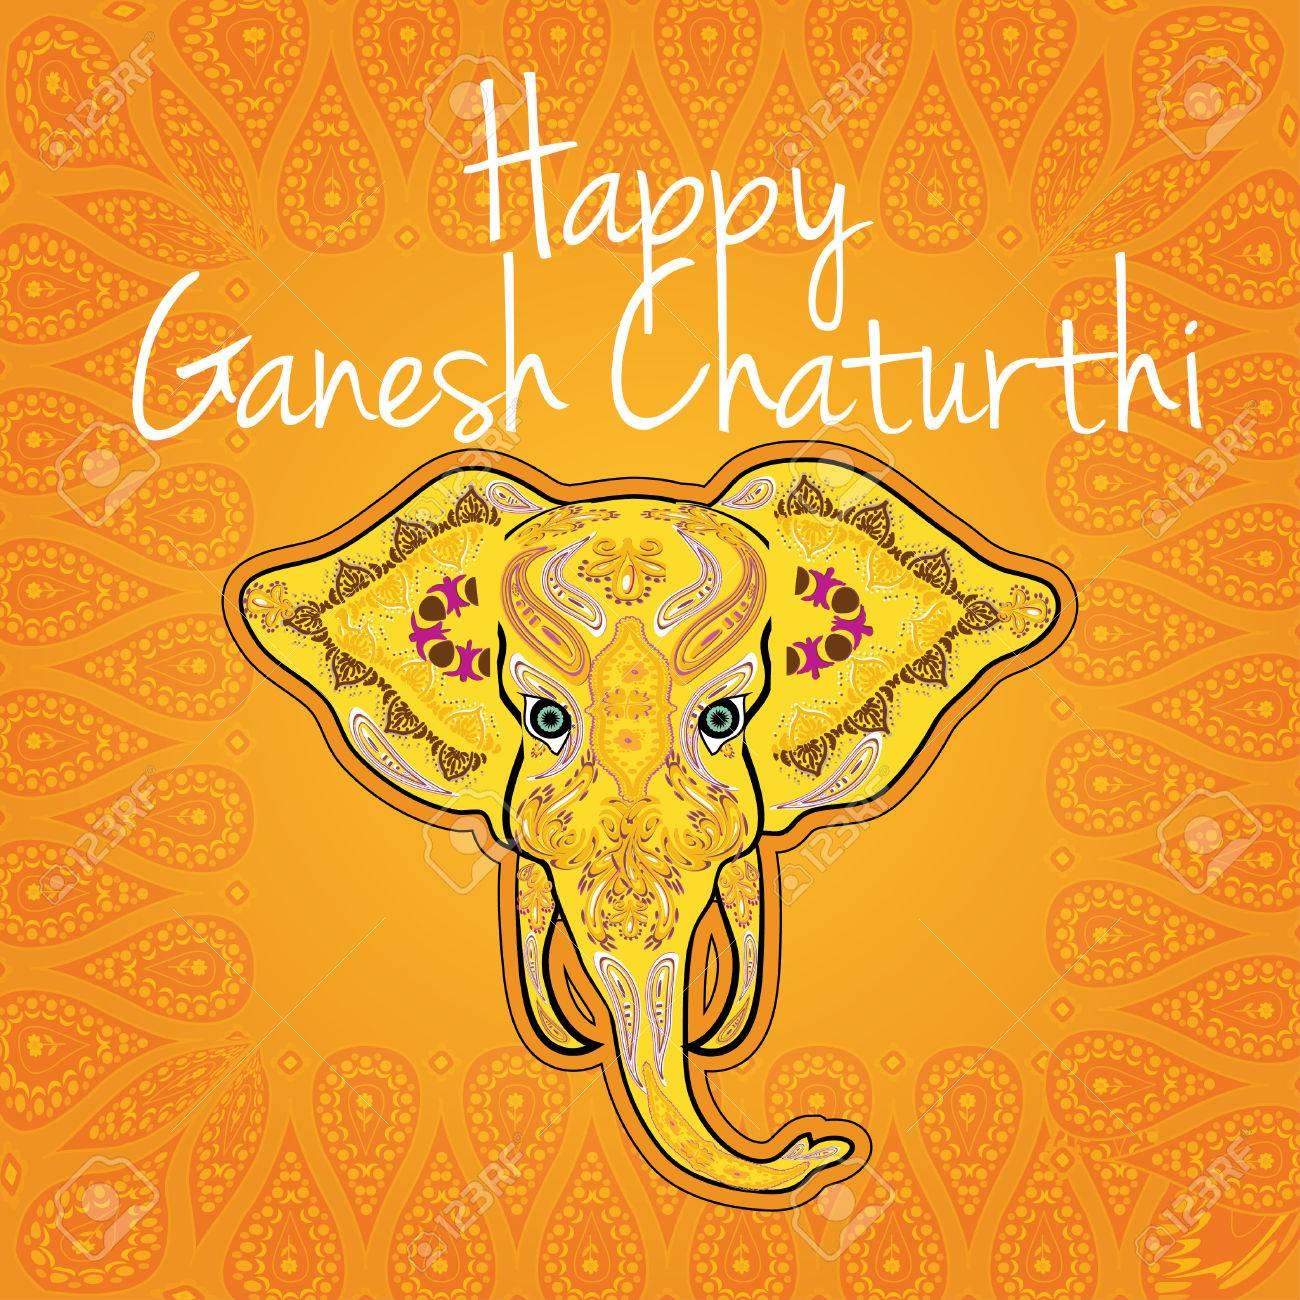 Happy Ganesh Chaturthi Festival Greeting Card Royalty Free Cliparts